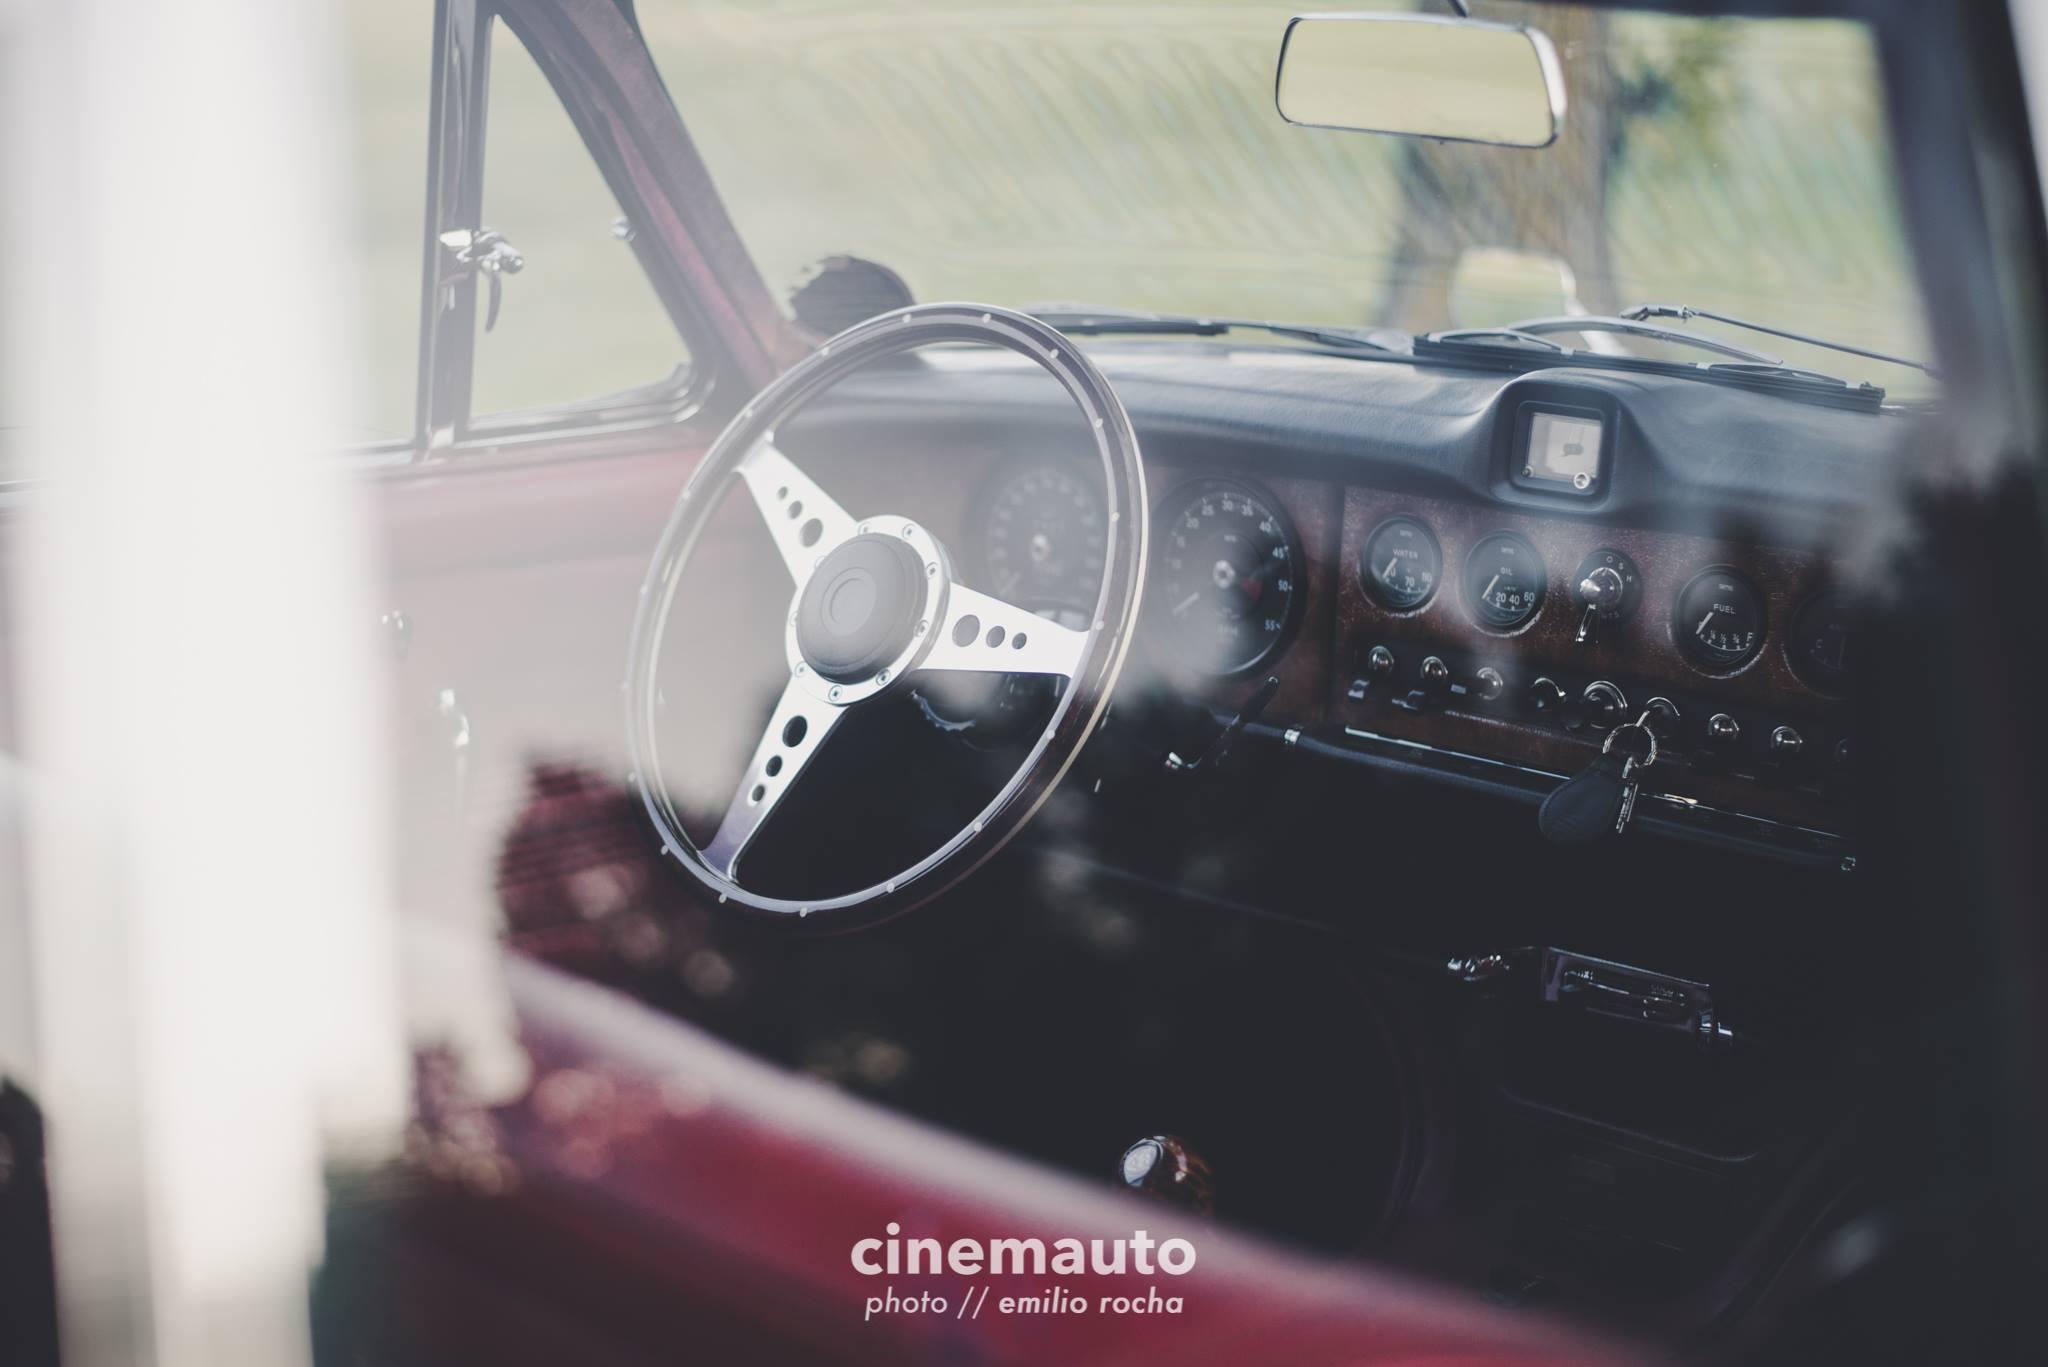 cinemauto-er3.jpg